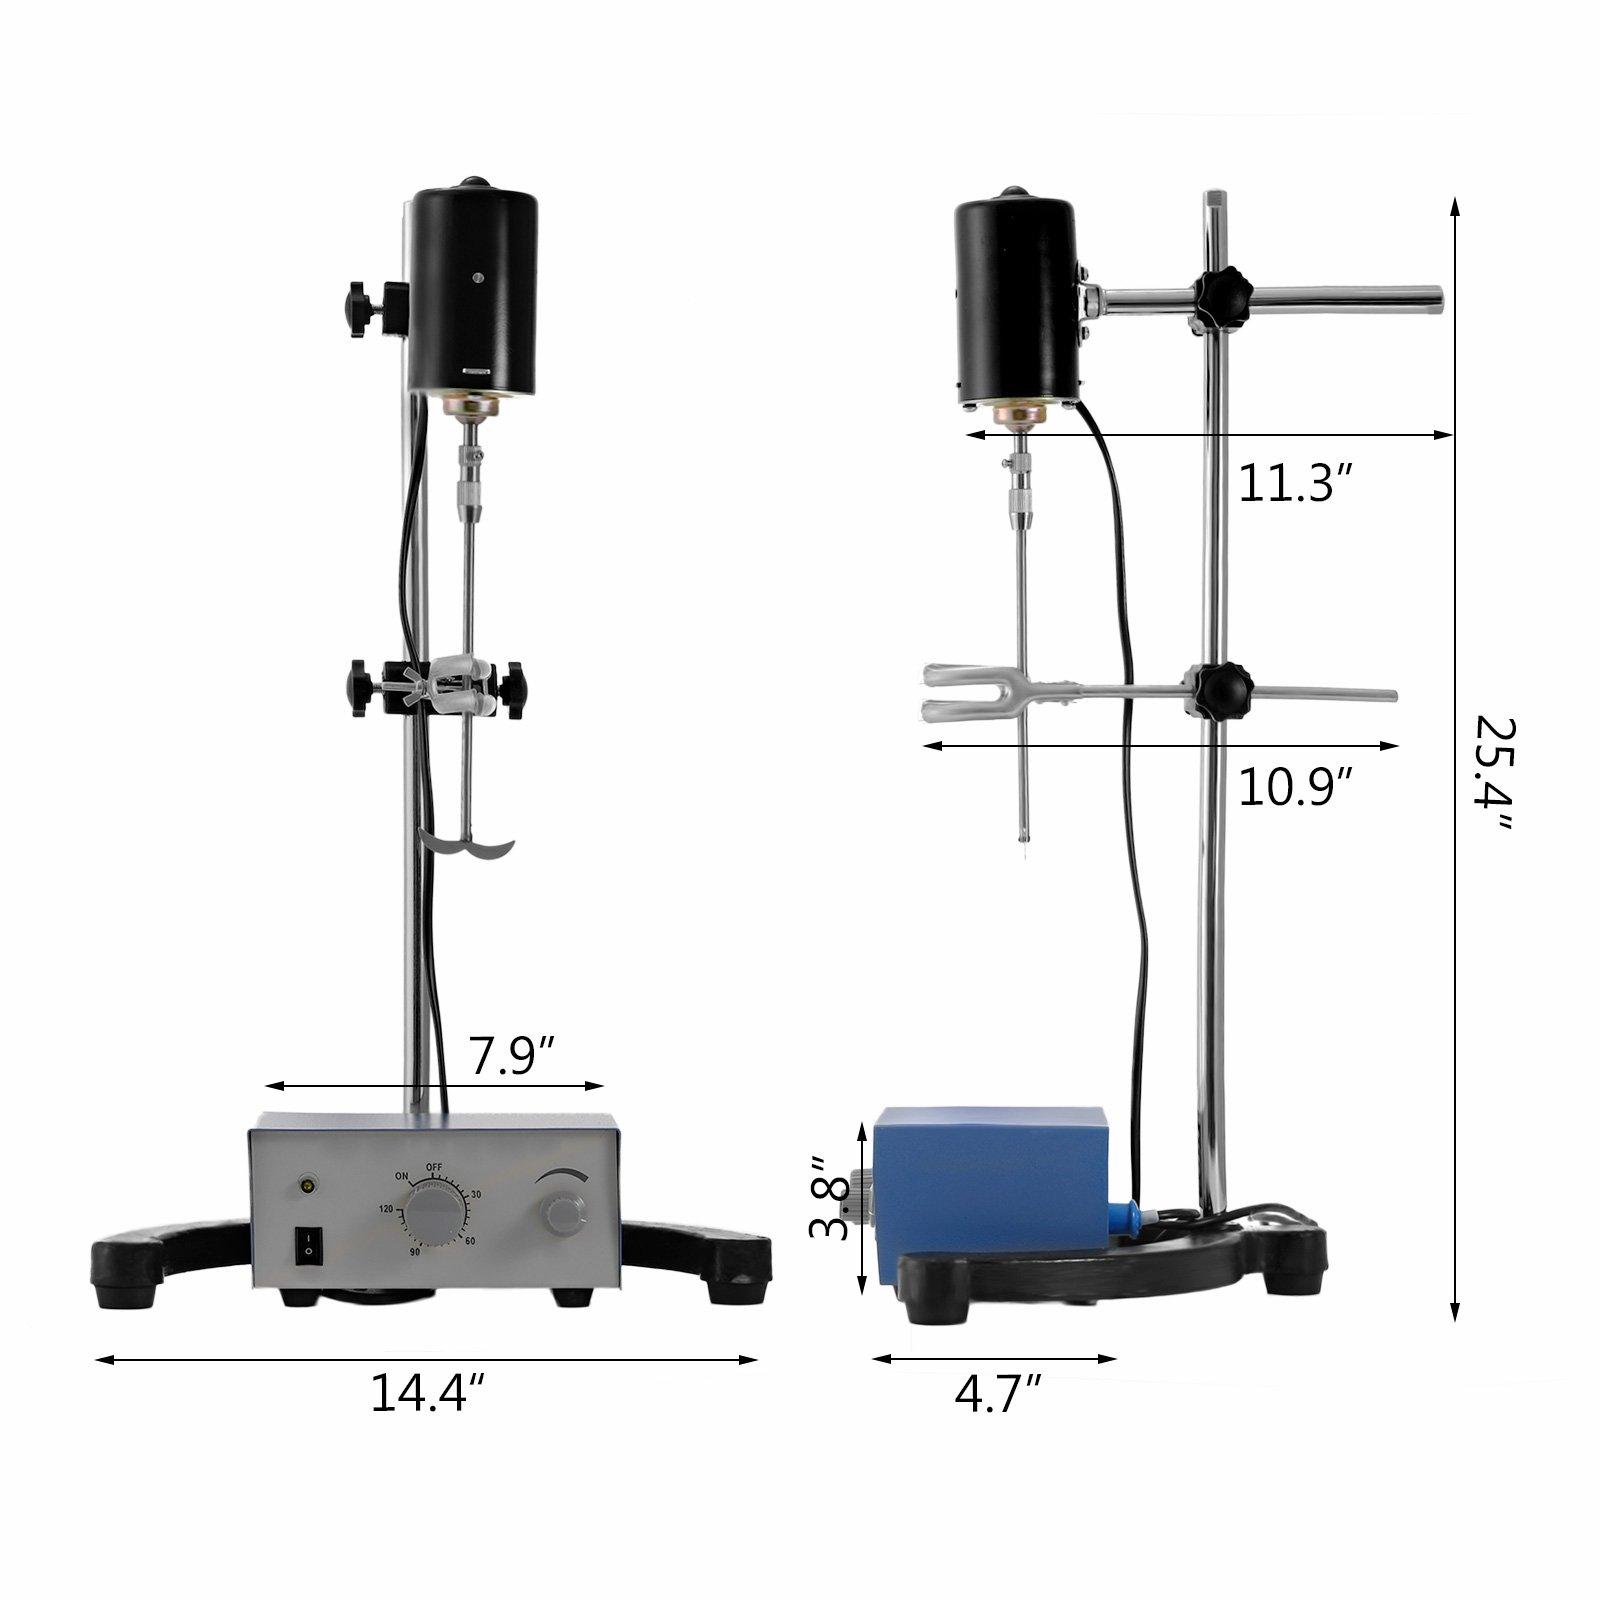 Mophorn Electric Overhead Stirrer Mixer 0-2000 RPM Overhead Stirrer Mixer 100W Lab Mixer Blender Variable Speed 0-120 Minutes Overhead Stirrer by Mophorn (Image #3)